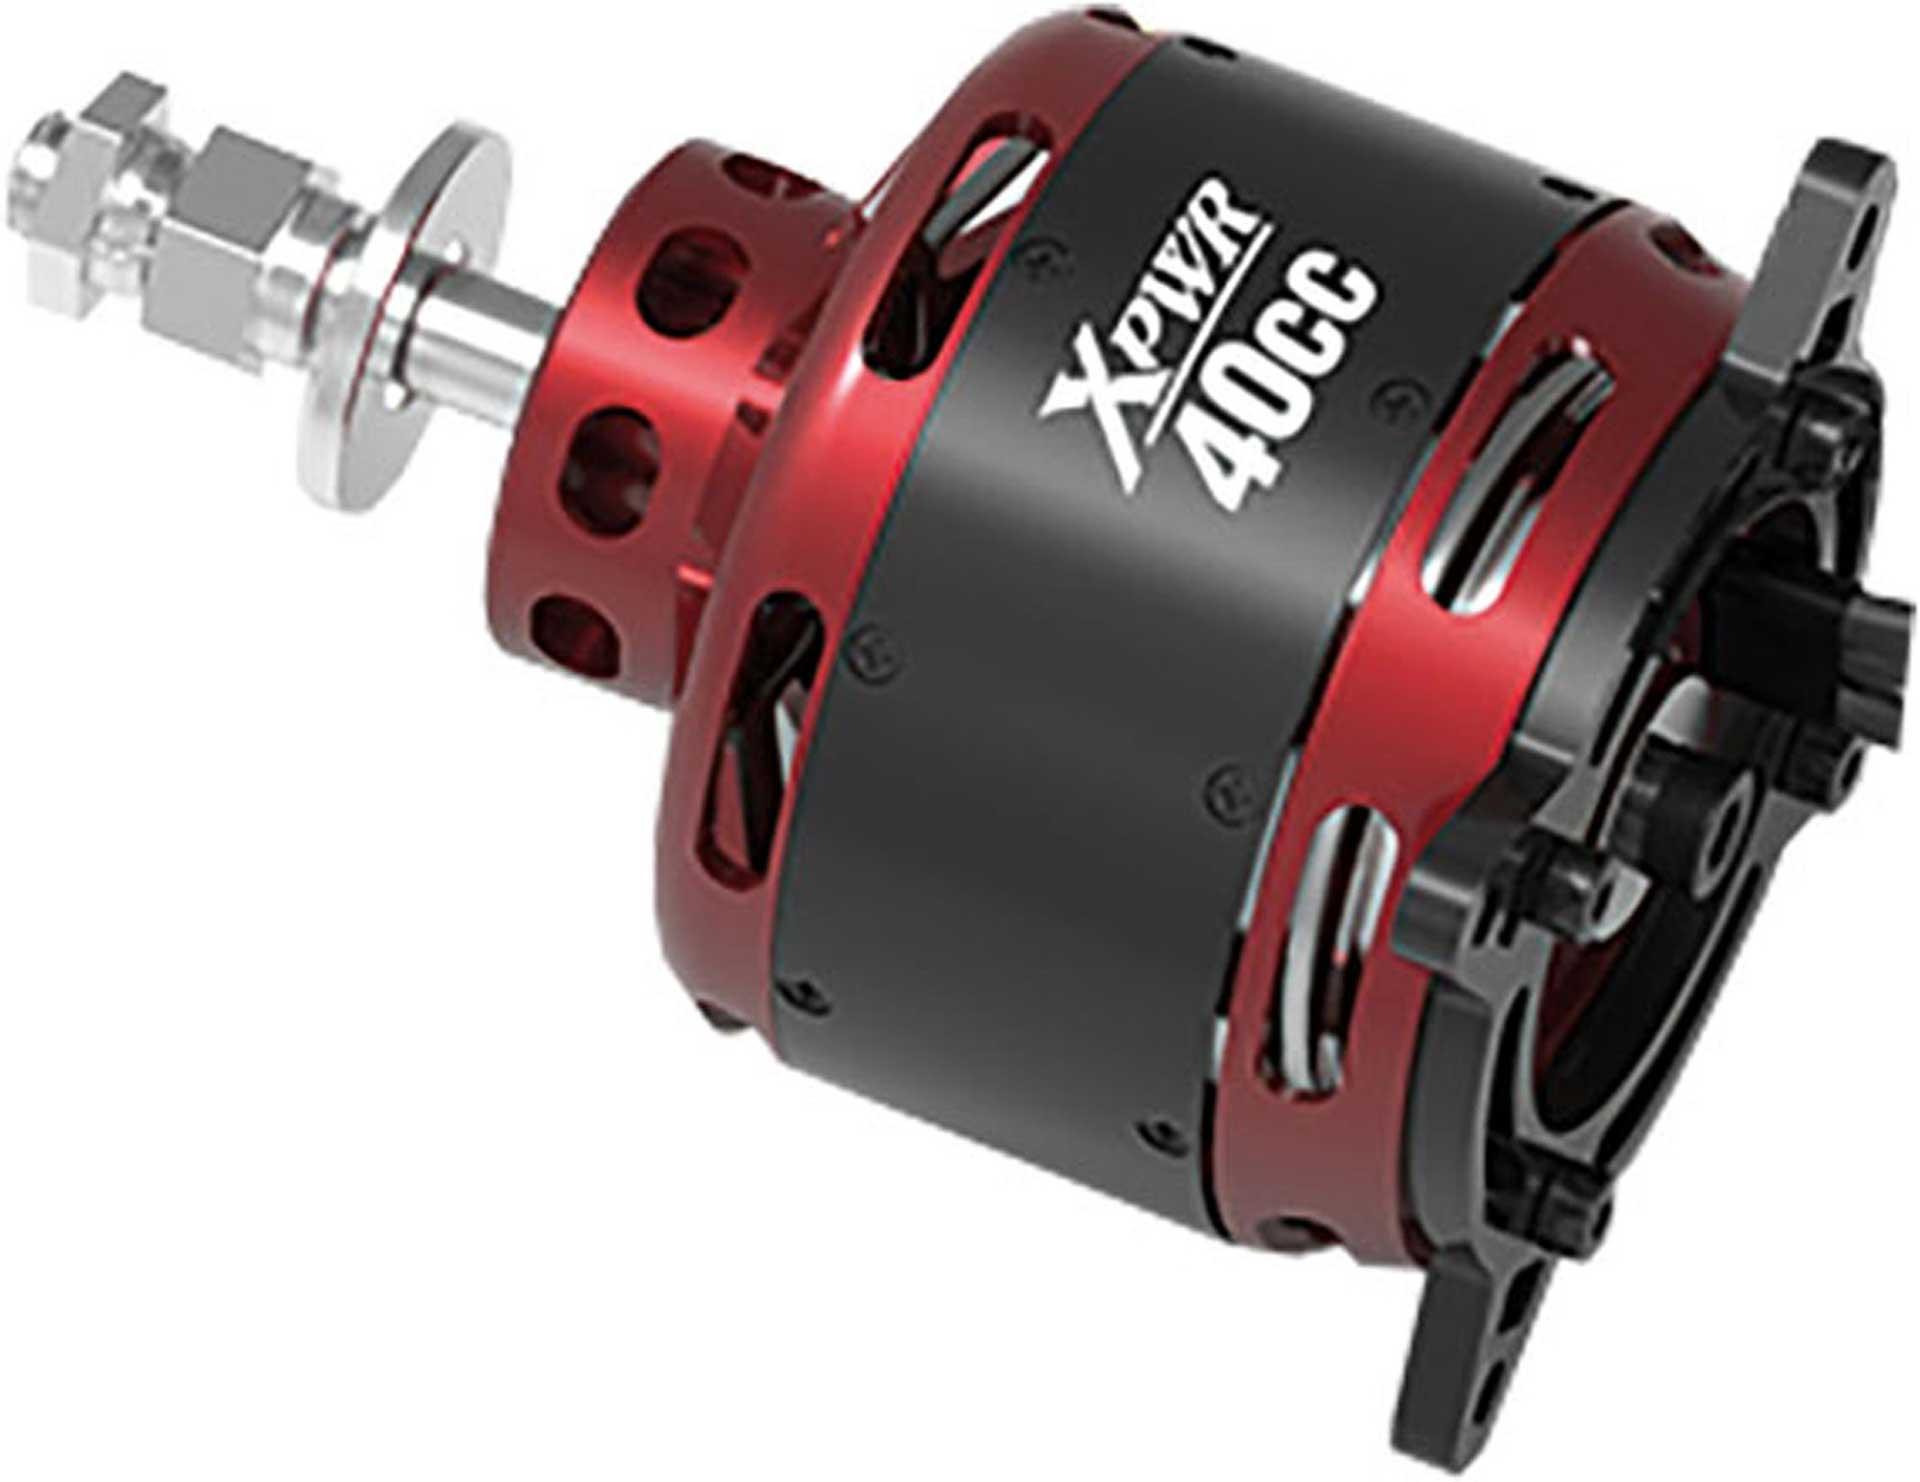 EXTREMEFLIGHT-RC XPWR 40CC BRUSHLESS MOTOR 200 K/V